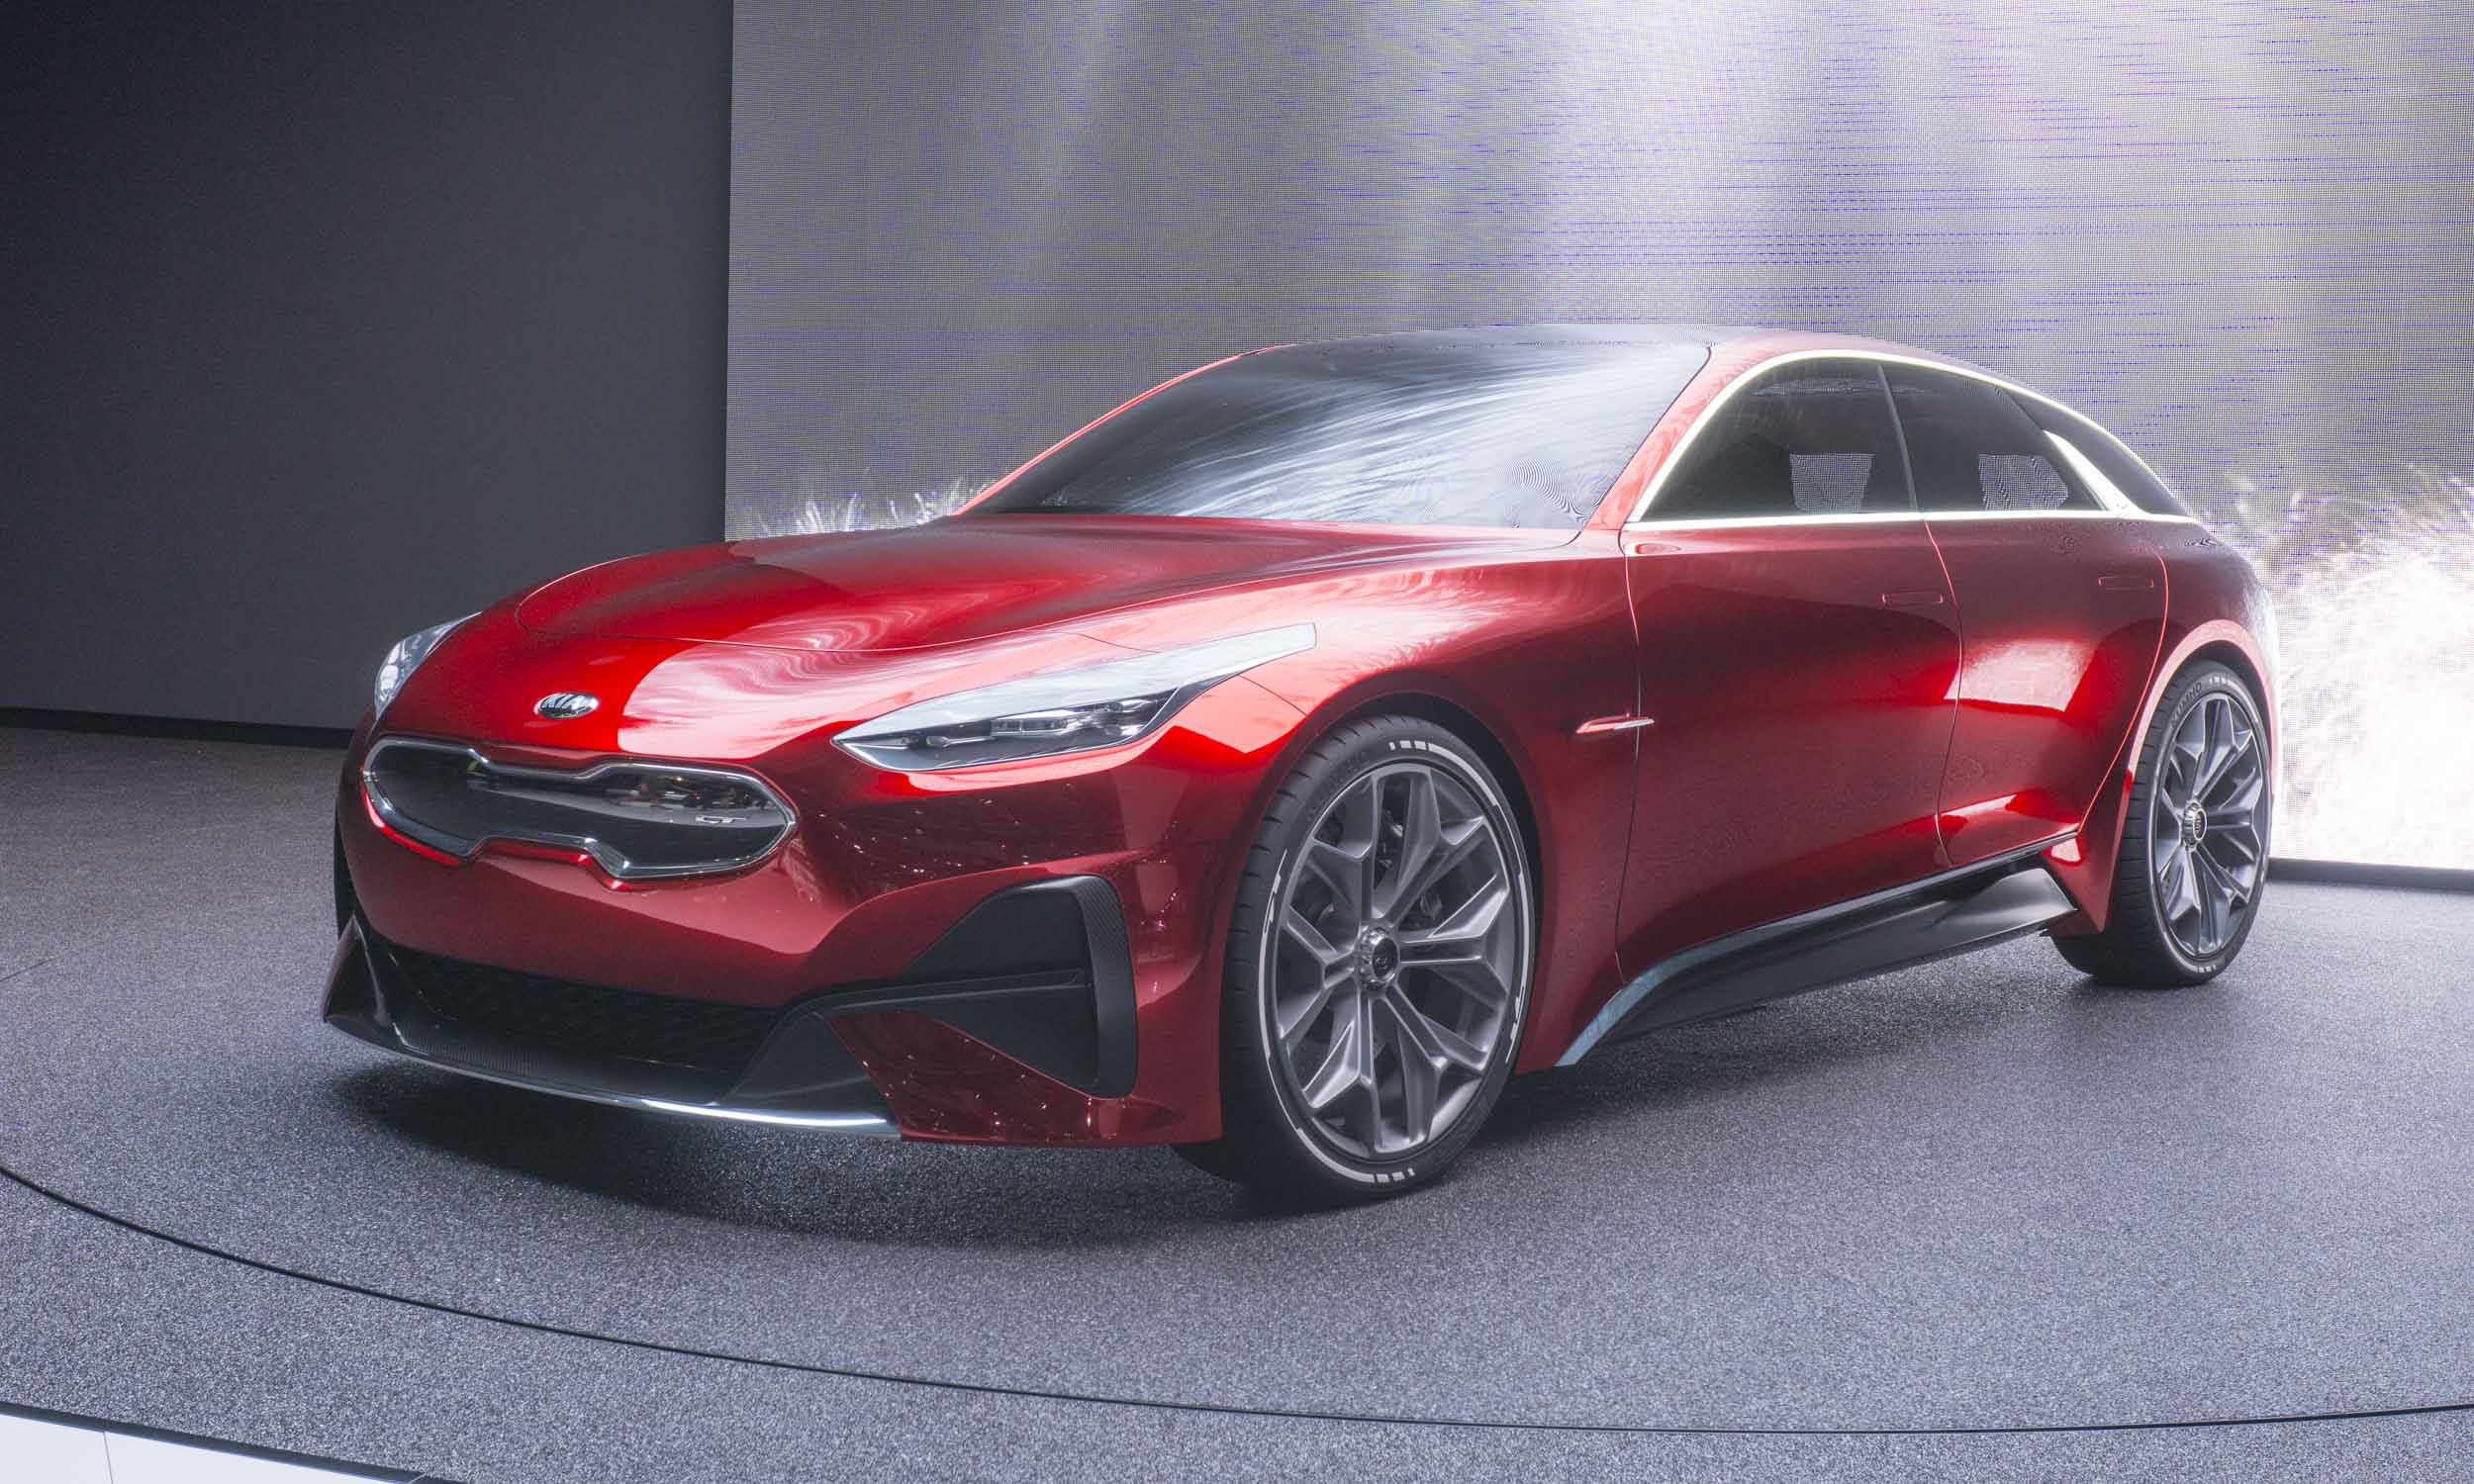 Frankfurt Motor Show 2017: Kia Proceed Concept - » AutoNXT